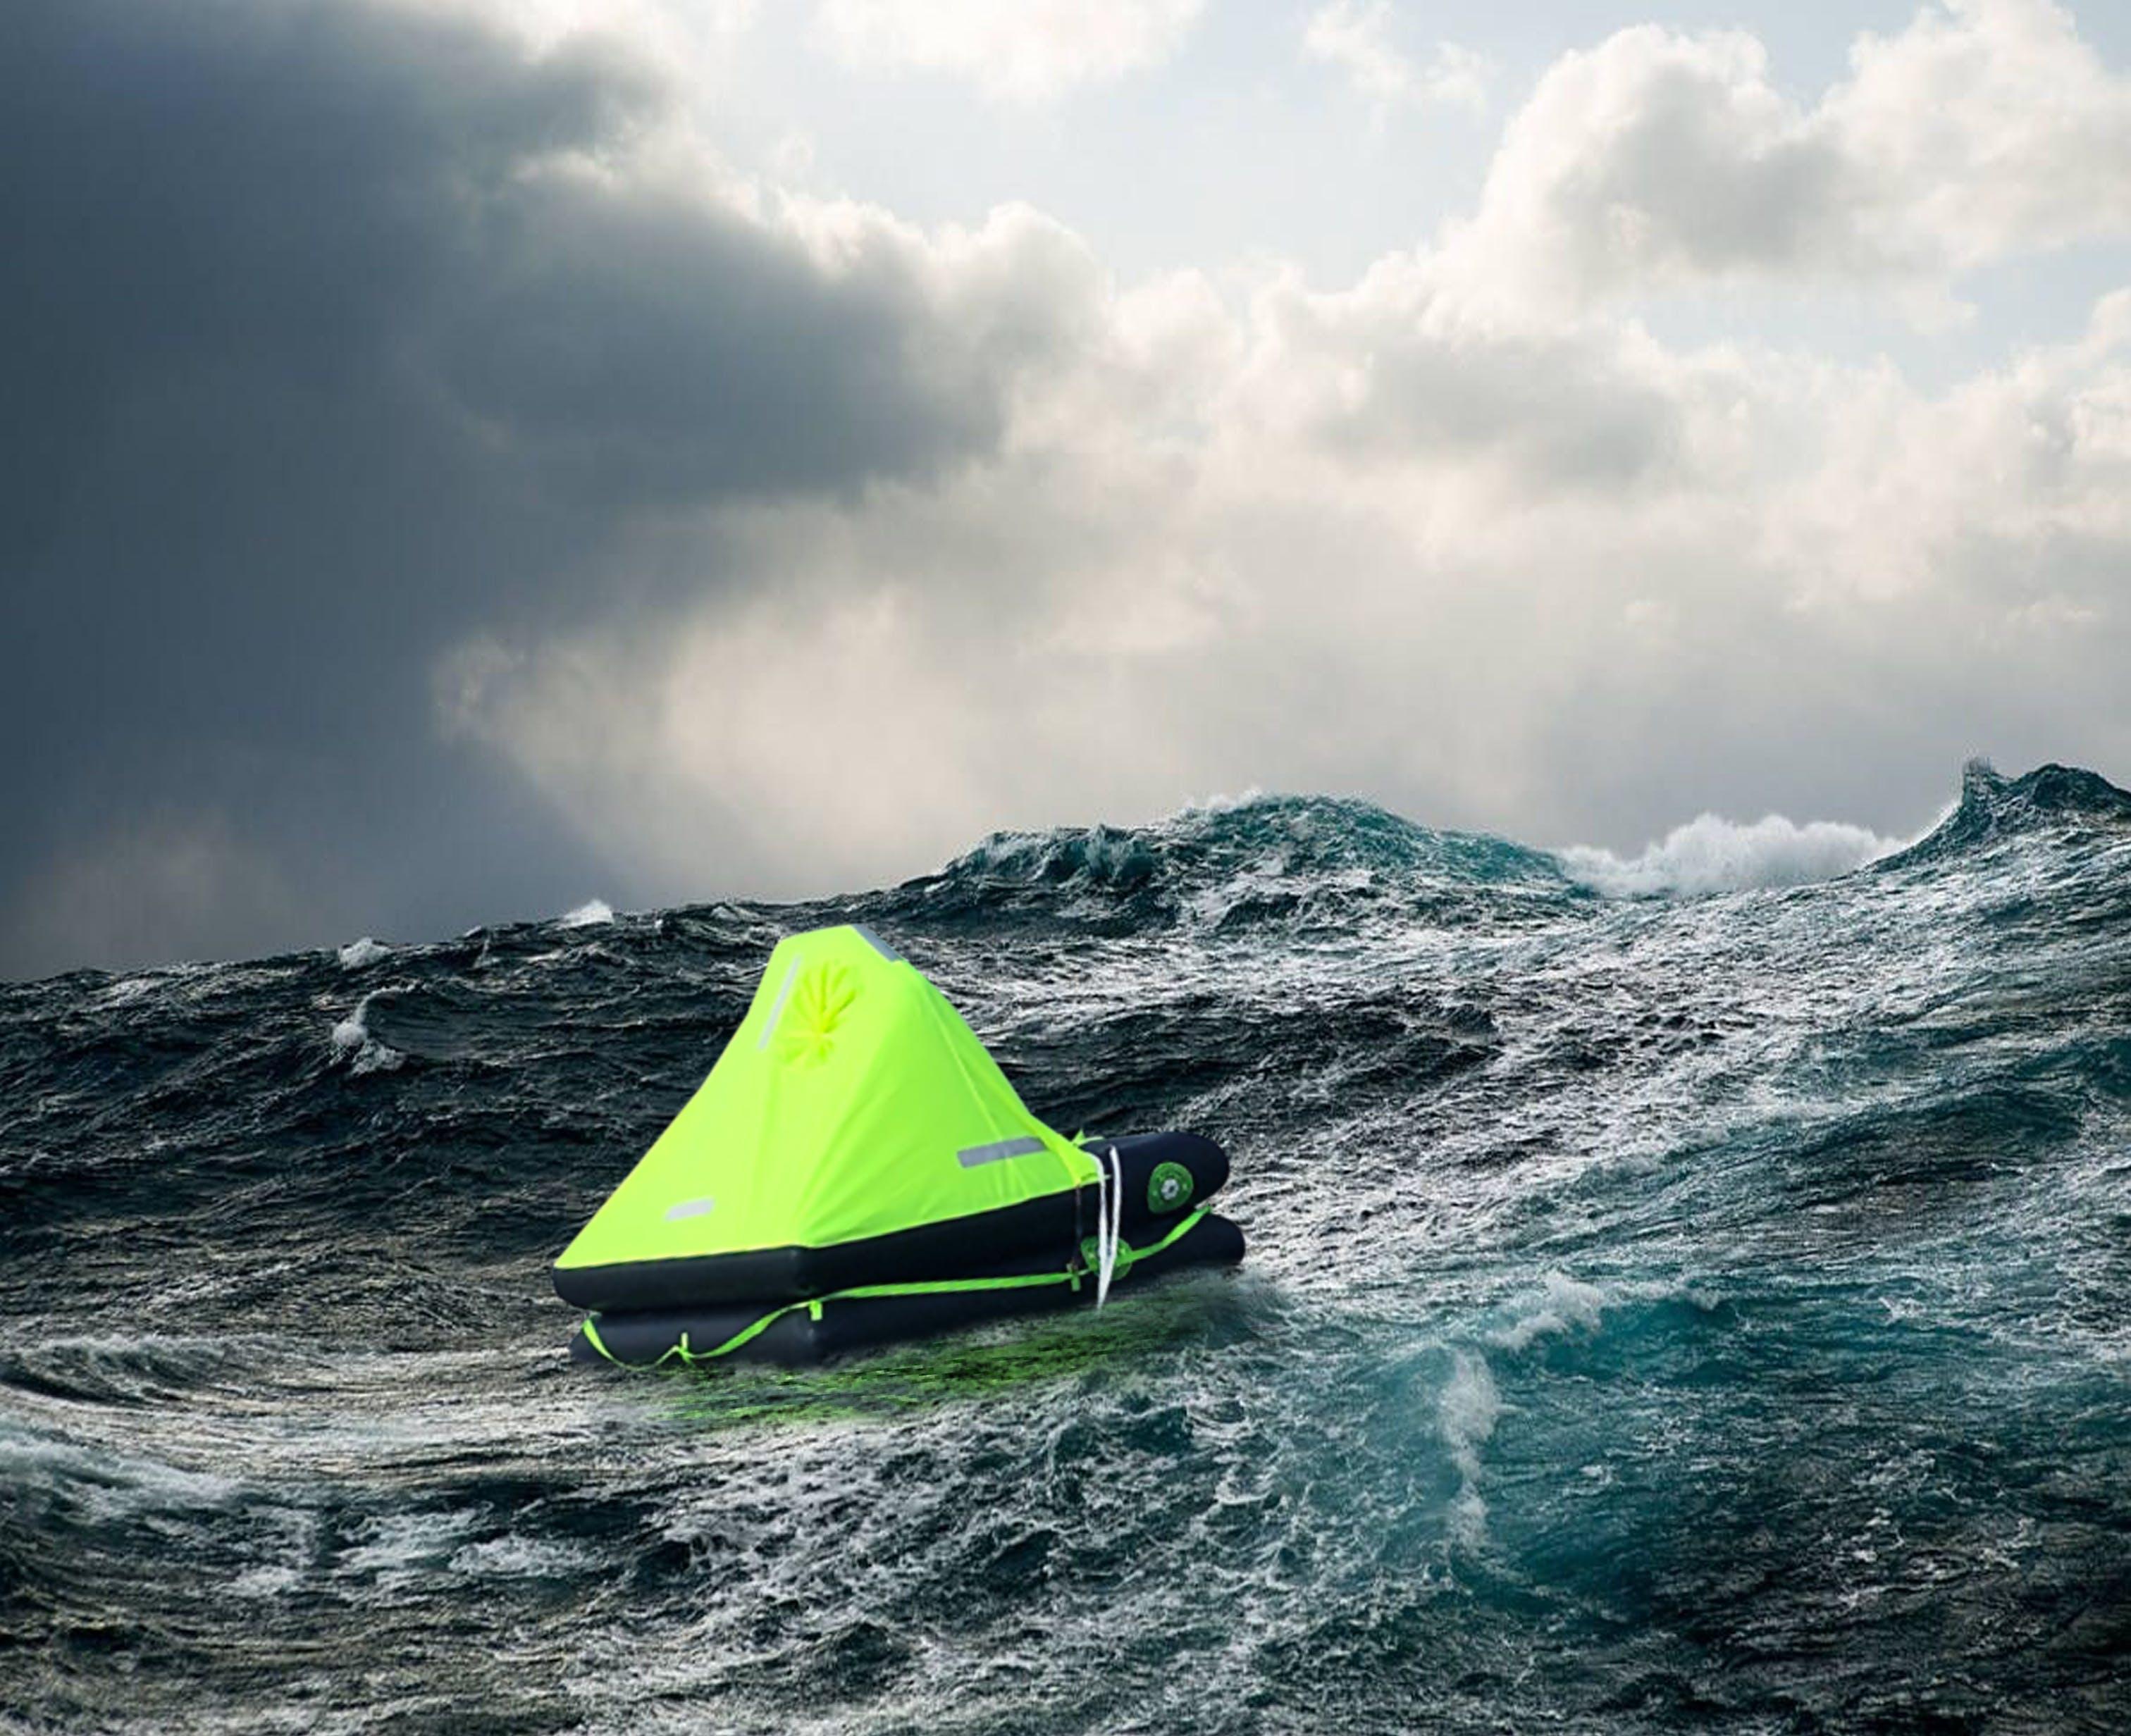 Datrex Raft in Rough Water